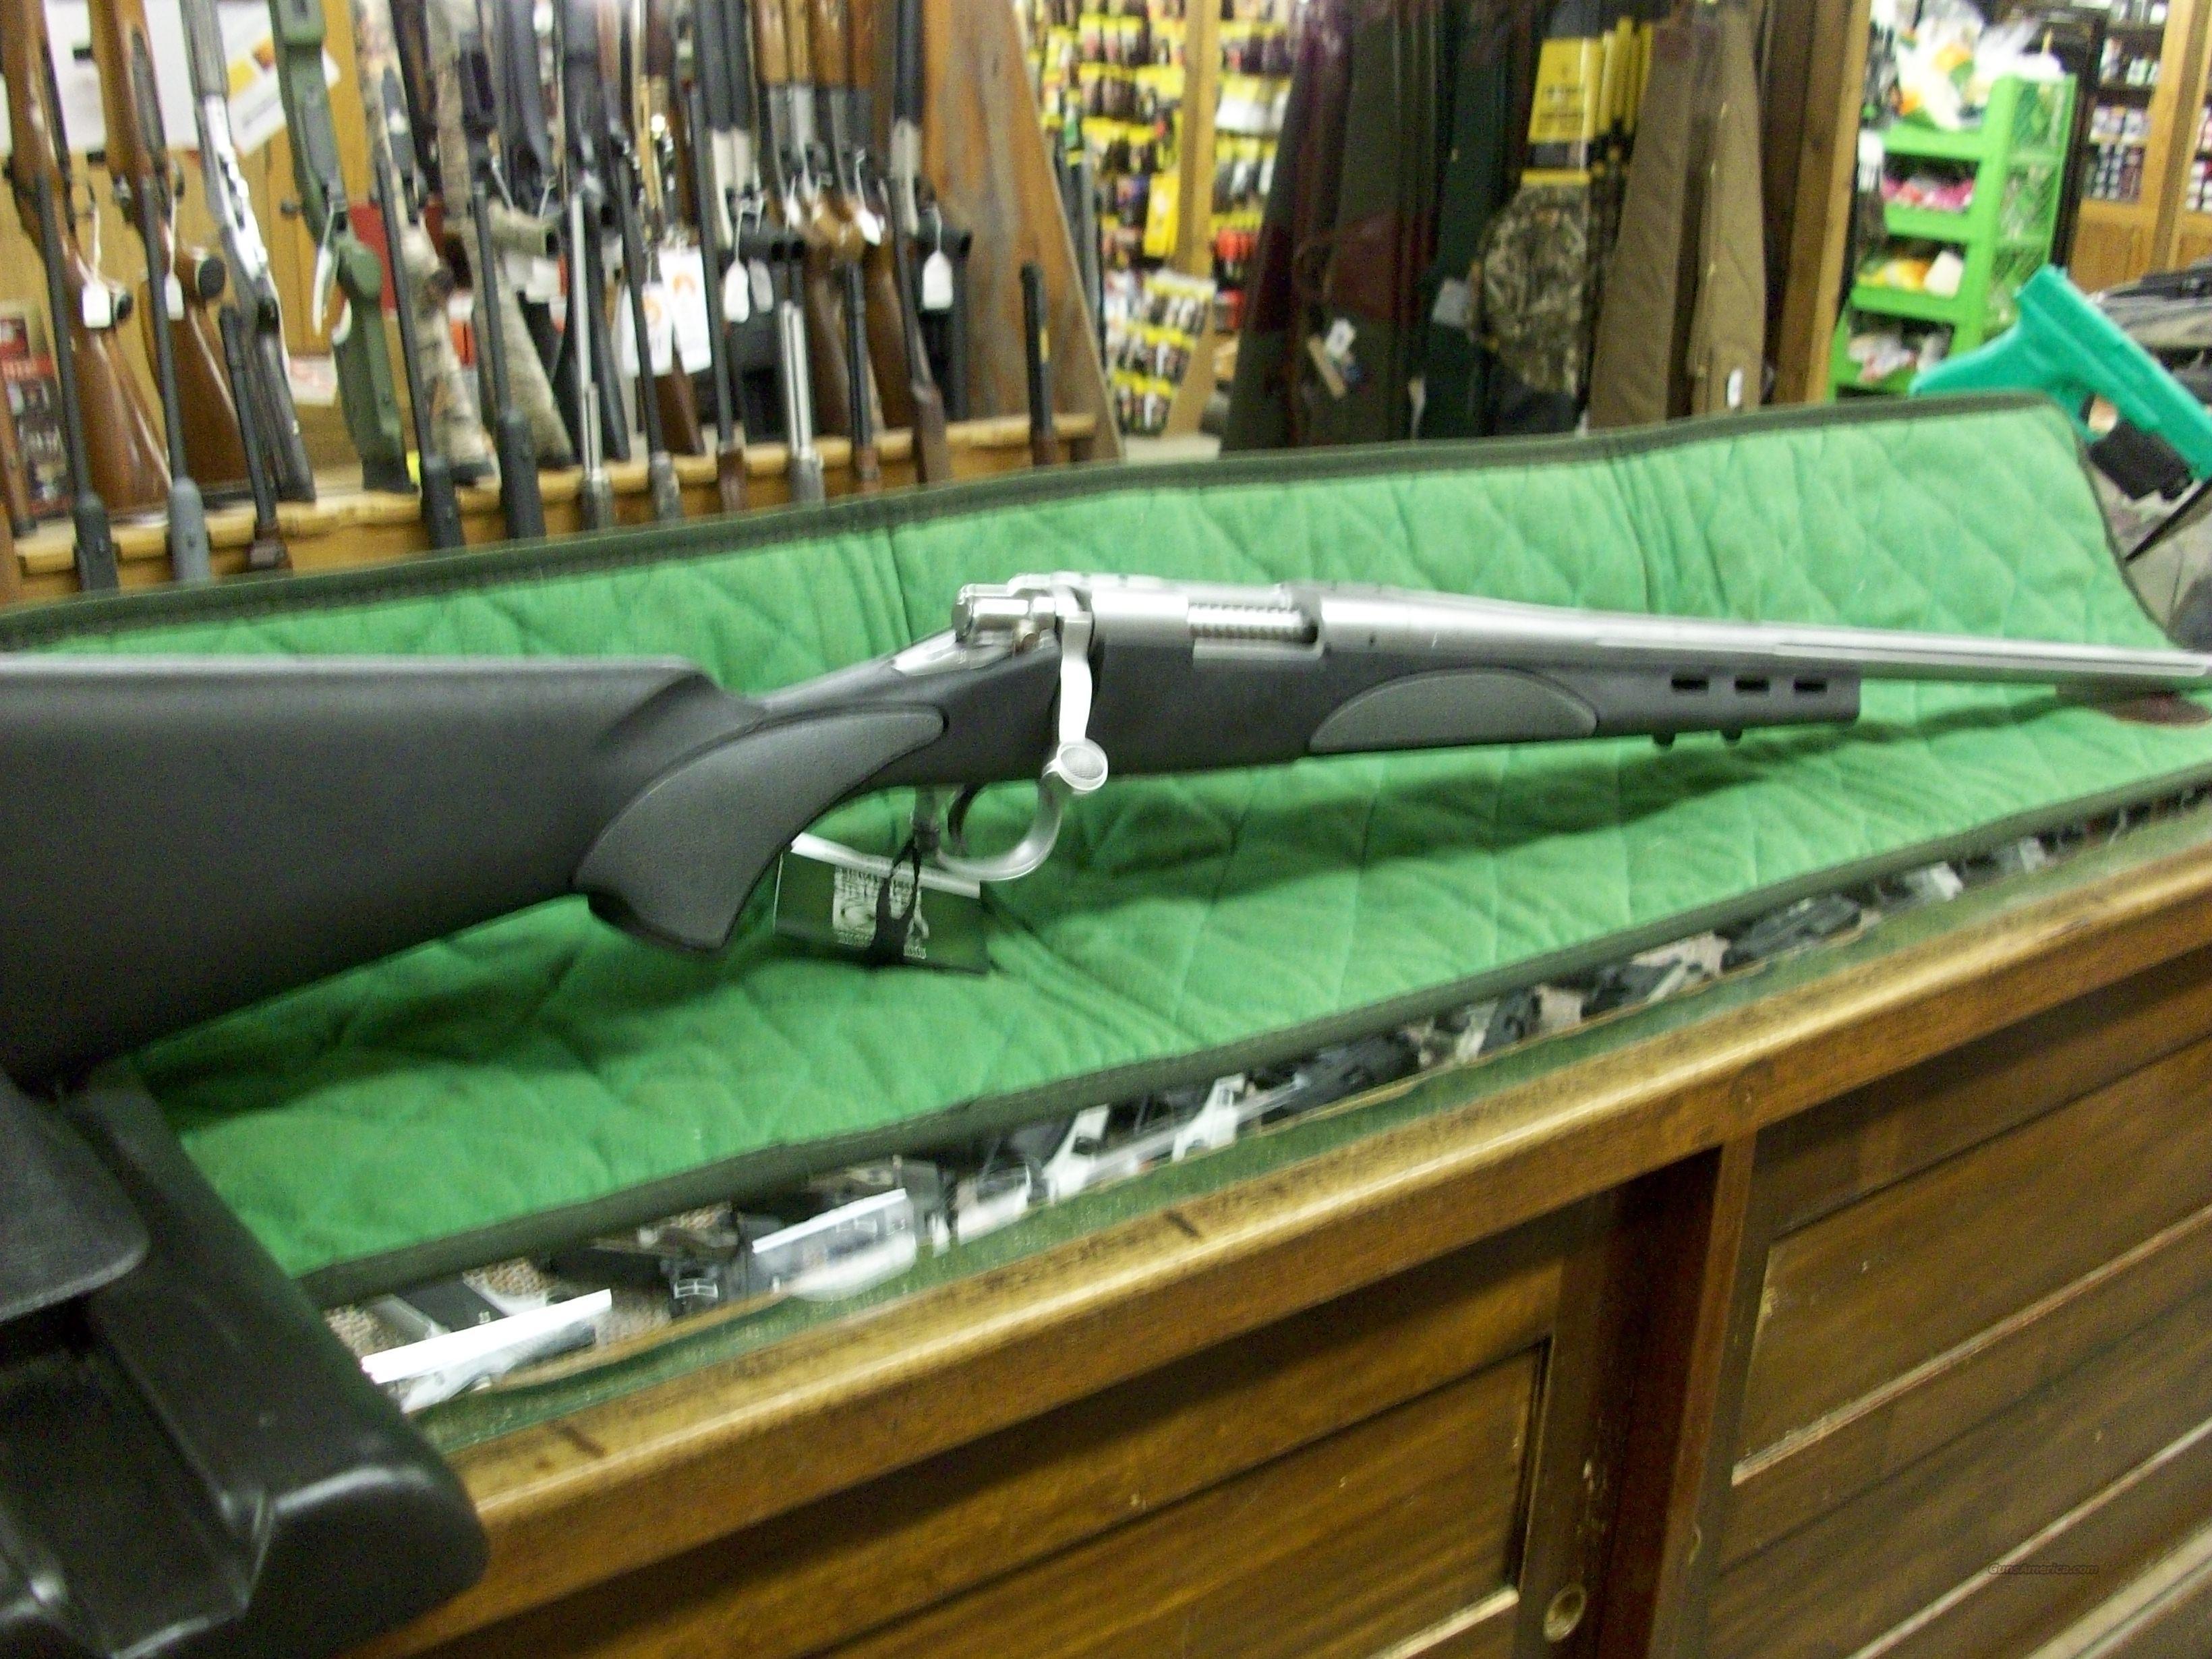 Remington Model 700 Varmint SF 223 Rem  84343 NO CC FEES  Guns > Rifles > Remington Rifles - Modern > Model 700 > Sporting